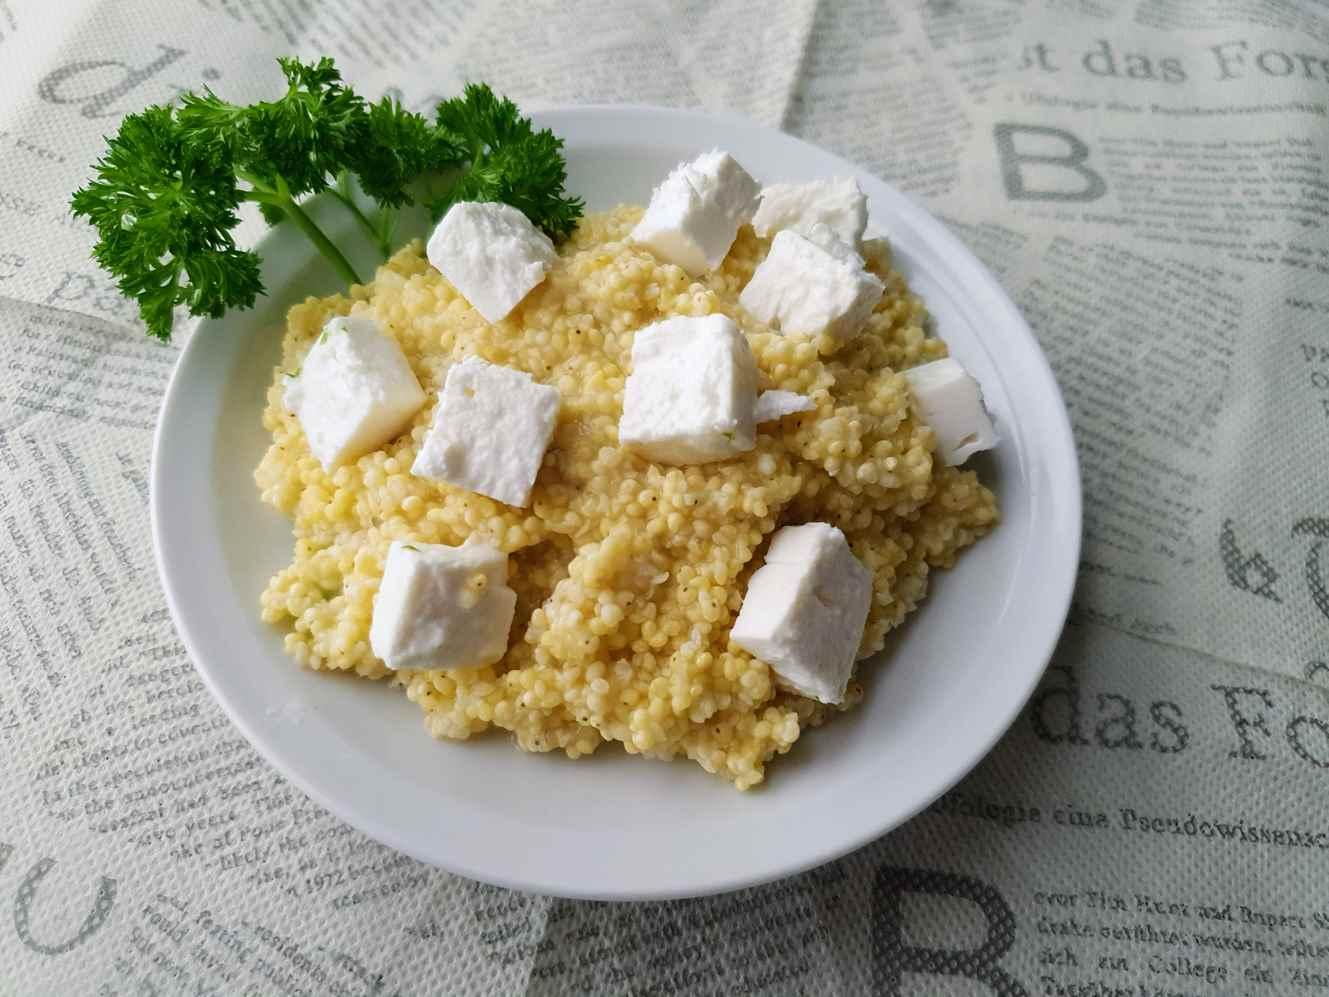 Sorų kruopų košė su feta sūriu